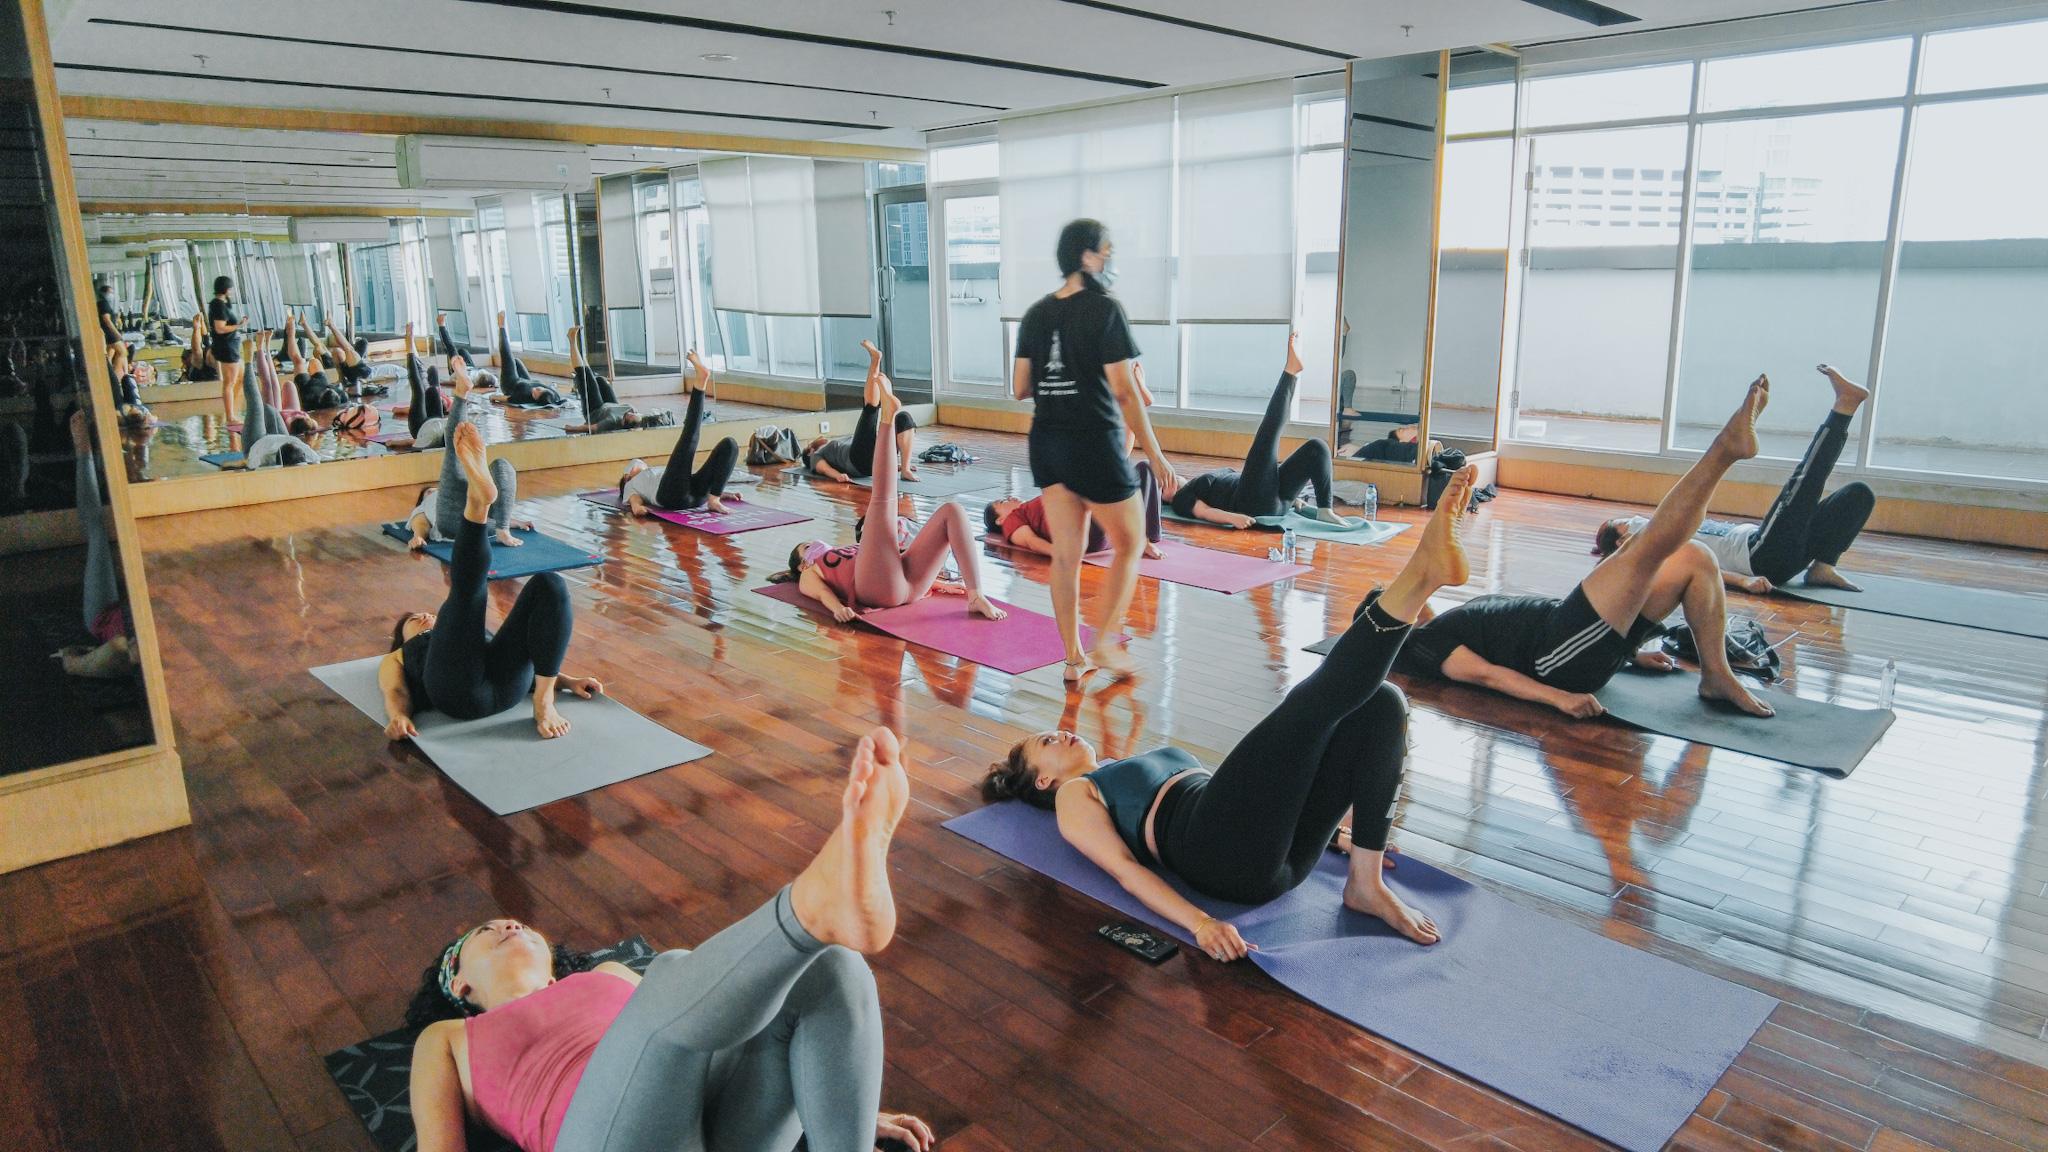 Tingkatkan Imunitas, Vasaka The Reiz Condo Ajak Penghuni Olahraga Yoga